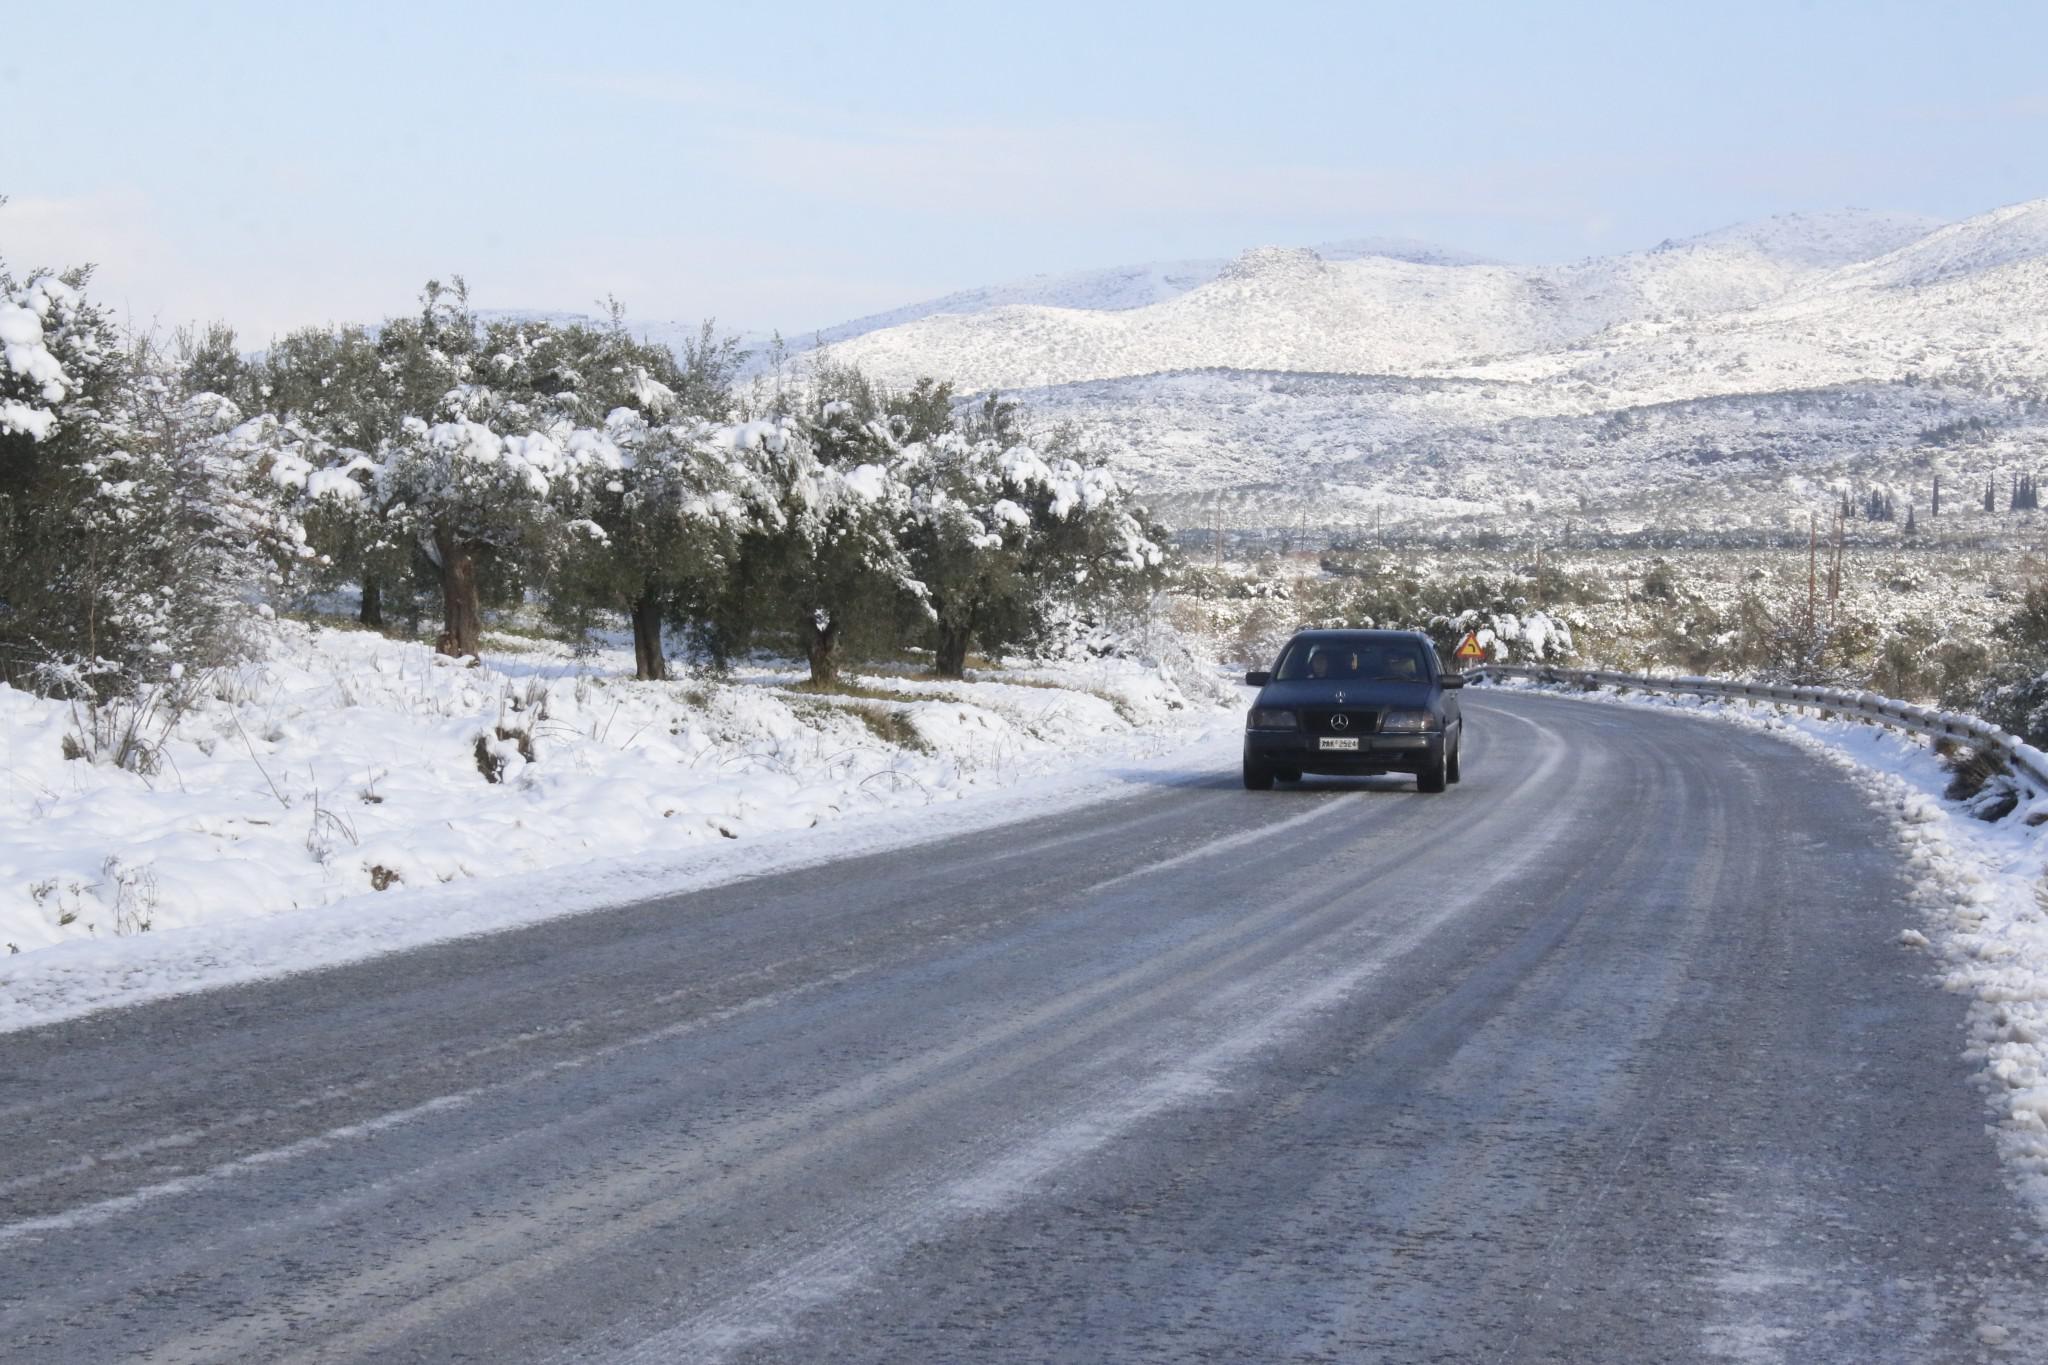 xionia-peloponisos-2 Τραγική κατάσταση στην Αλόννησο  – Πολλά προβλήματα σε όλη την Ελλάδα από τον χιονιά